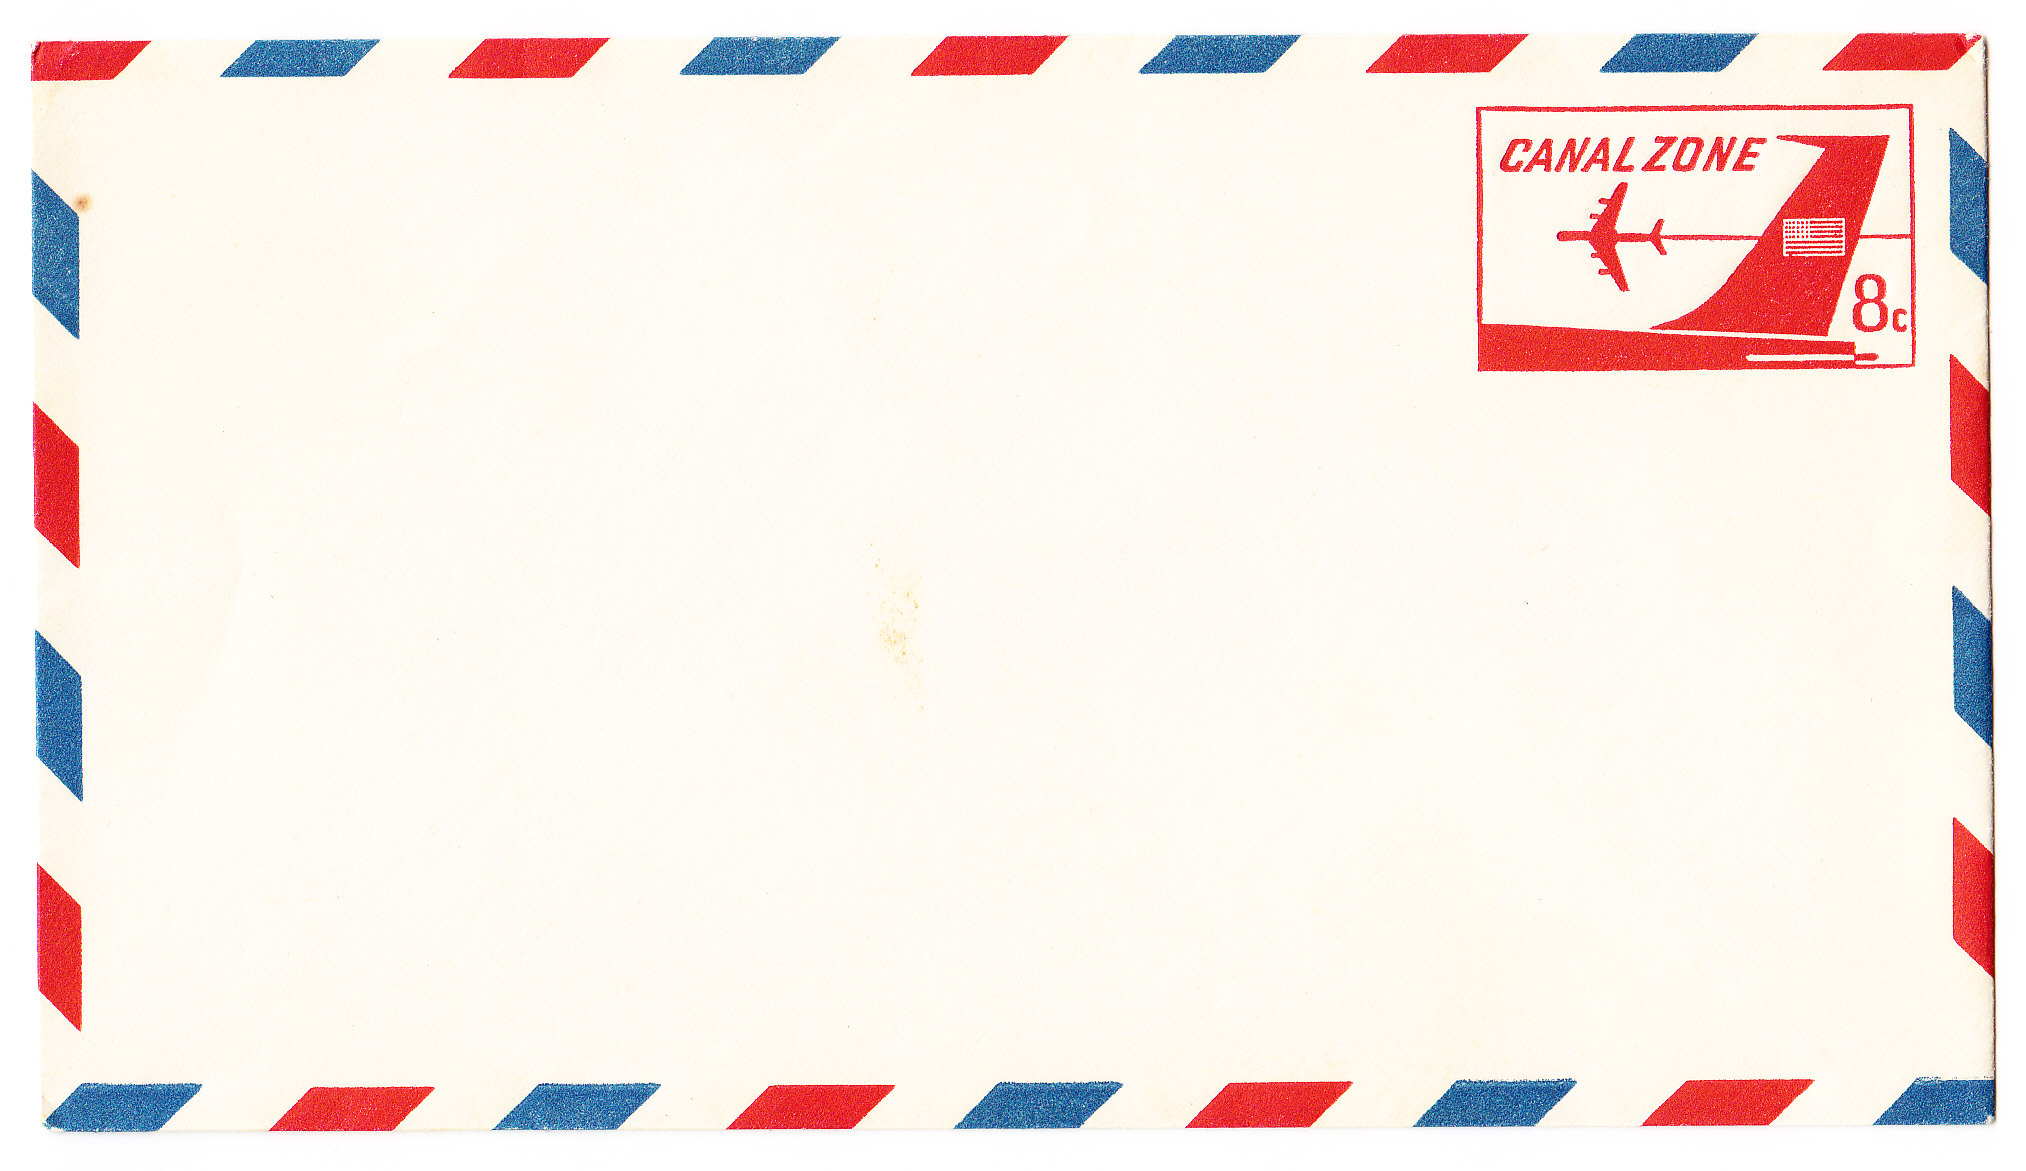 Canal Zone Study Group - stampwebsites.com